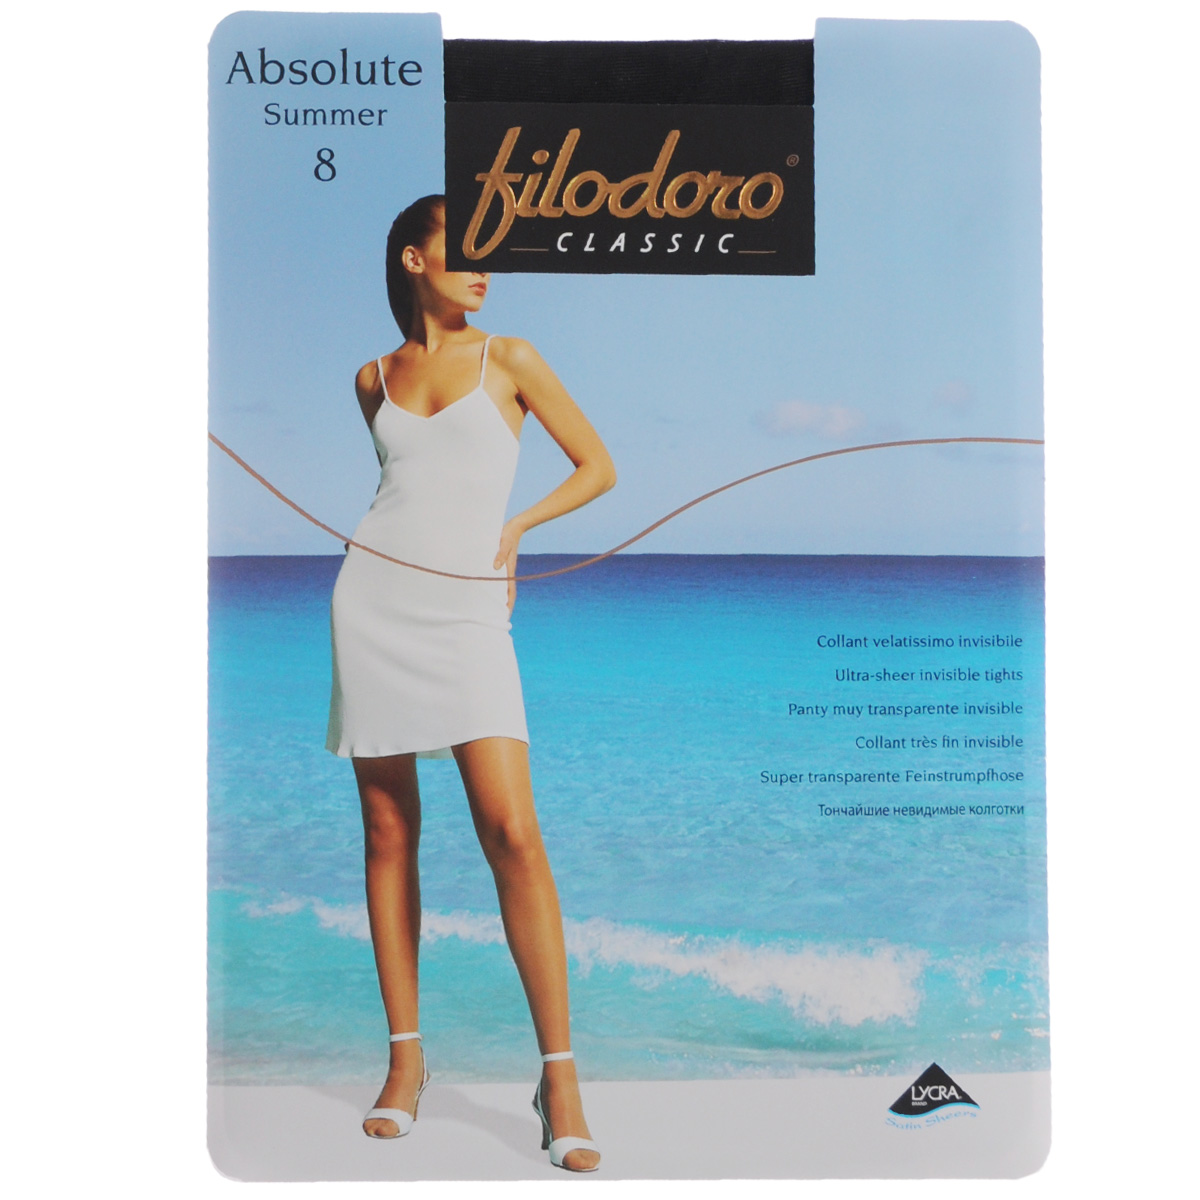 Колготки женские Filodoro Classic Absolute Summer 8, цвет: Nero (черный). C109155FC. Размер 4 (L) колготки filodoro linea размер m плотность 20 den chic nero